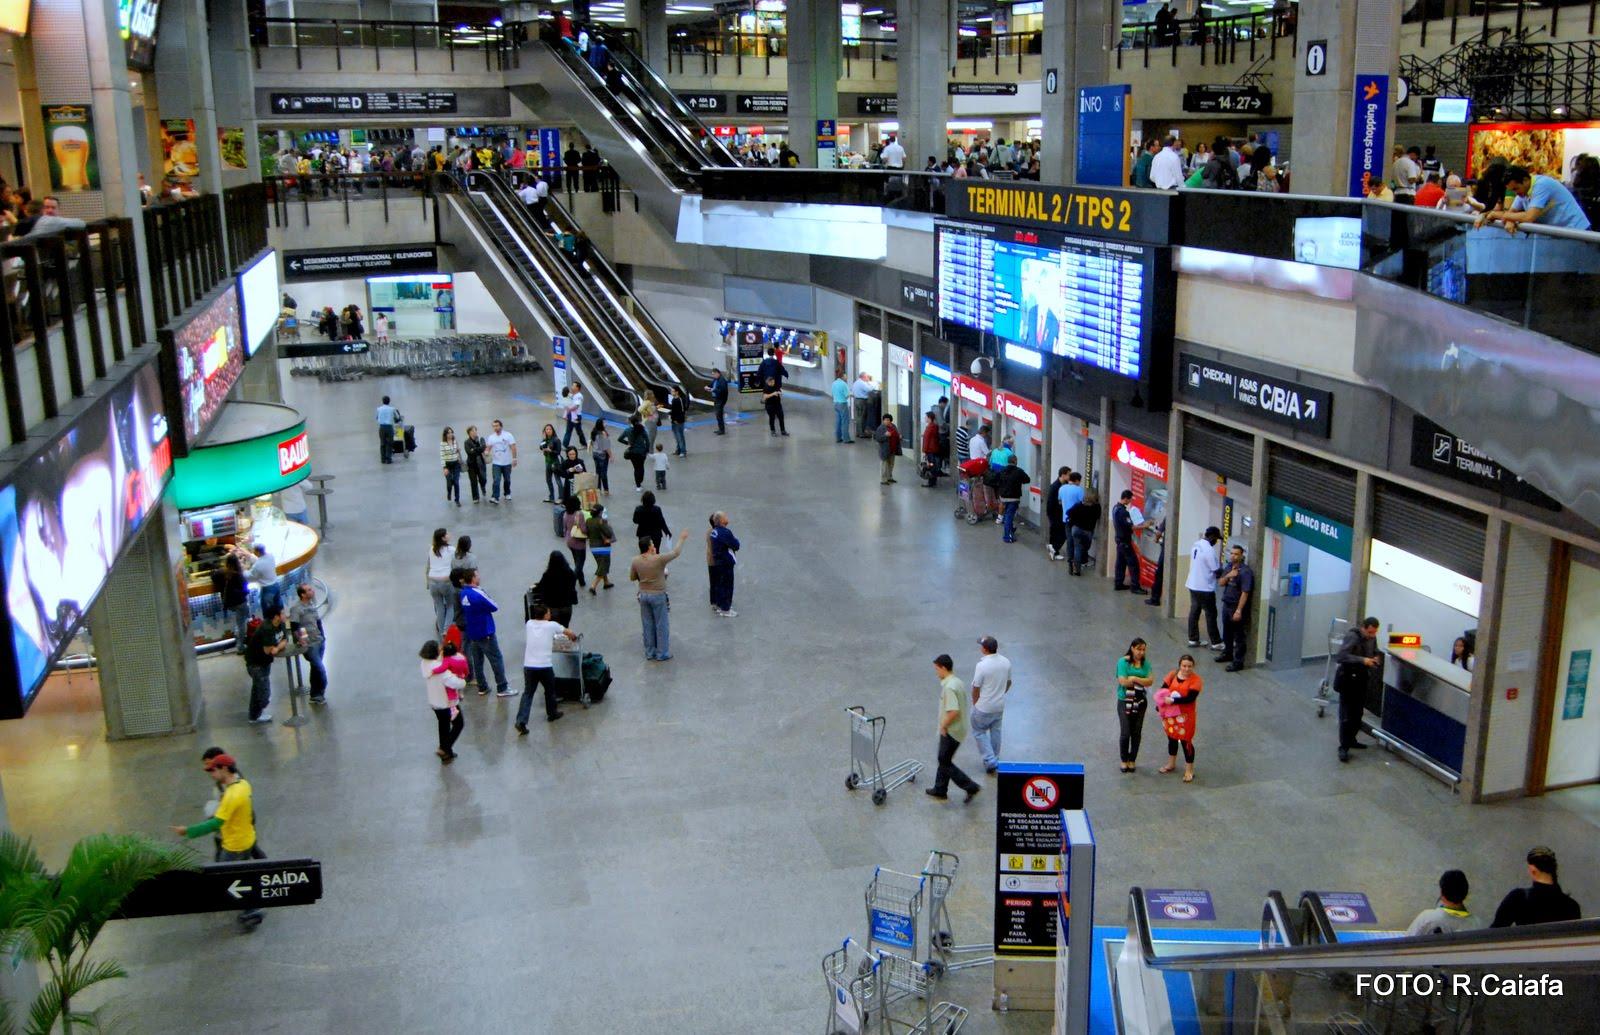 Aeroporto Sp : Cup brazil 2014: aeroporto internacional guarulhos são paulo